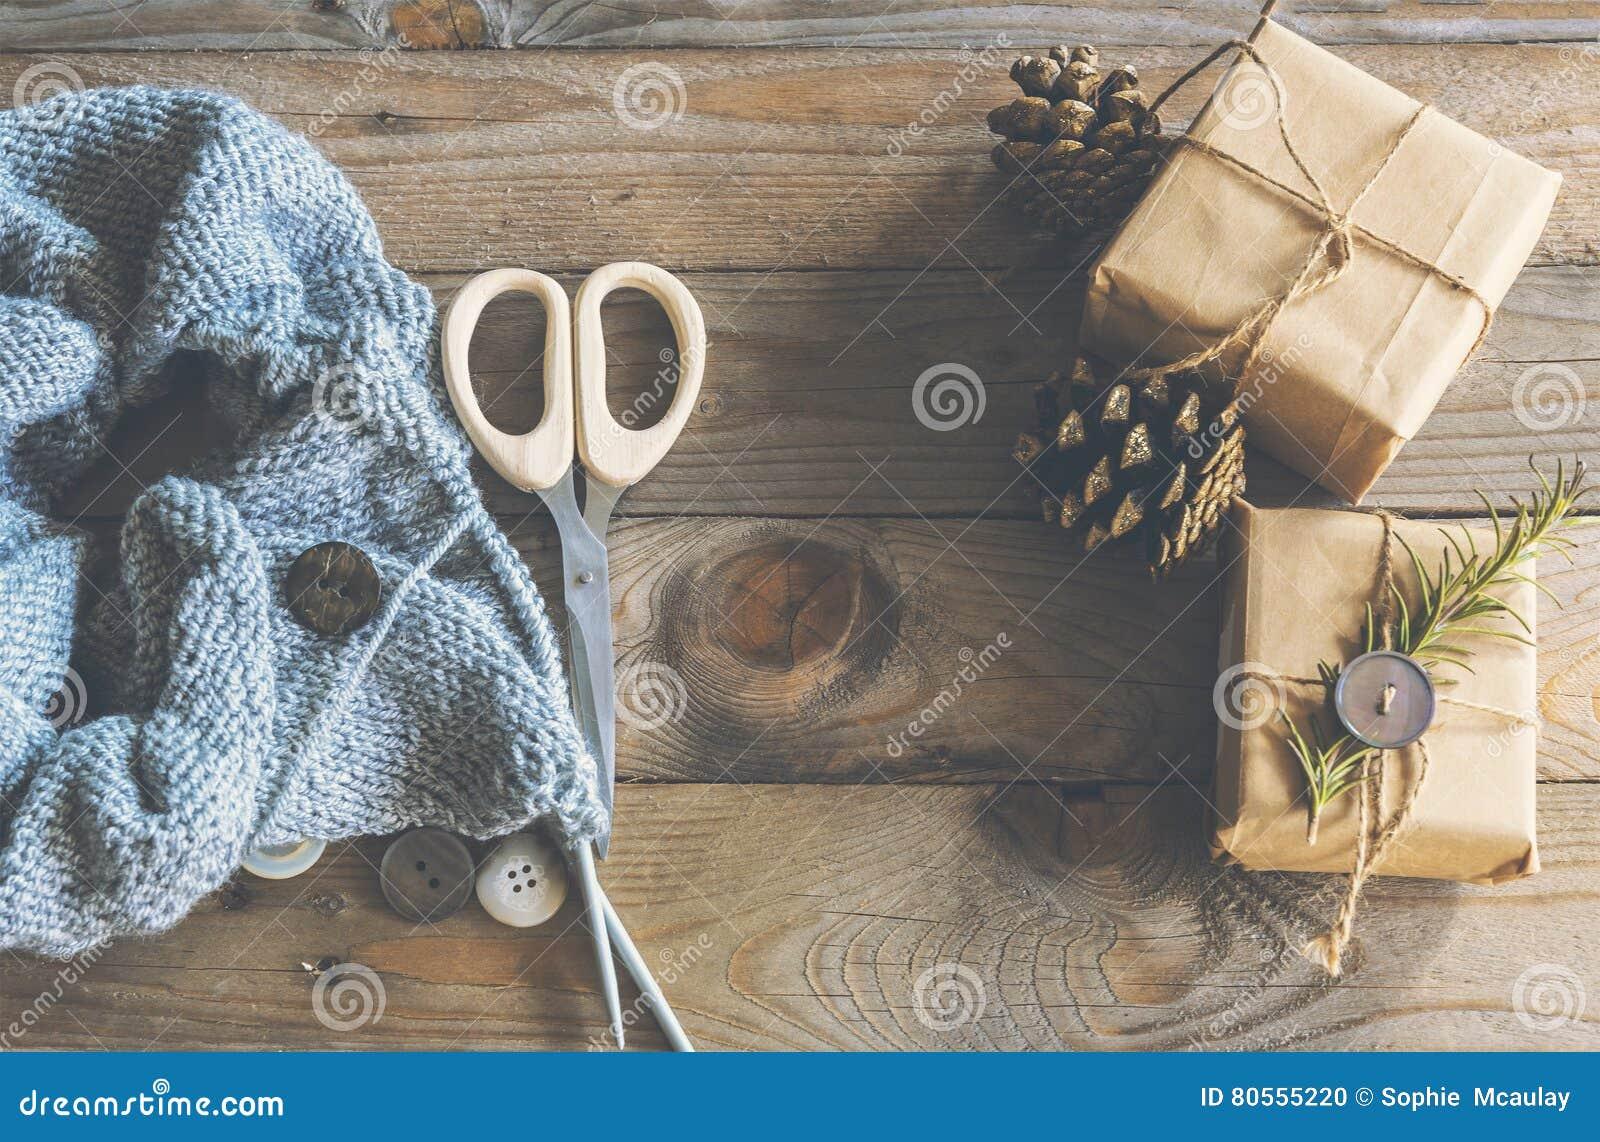 Knitting christmas gifts stock photo. Image of fall, fashion - 80555220